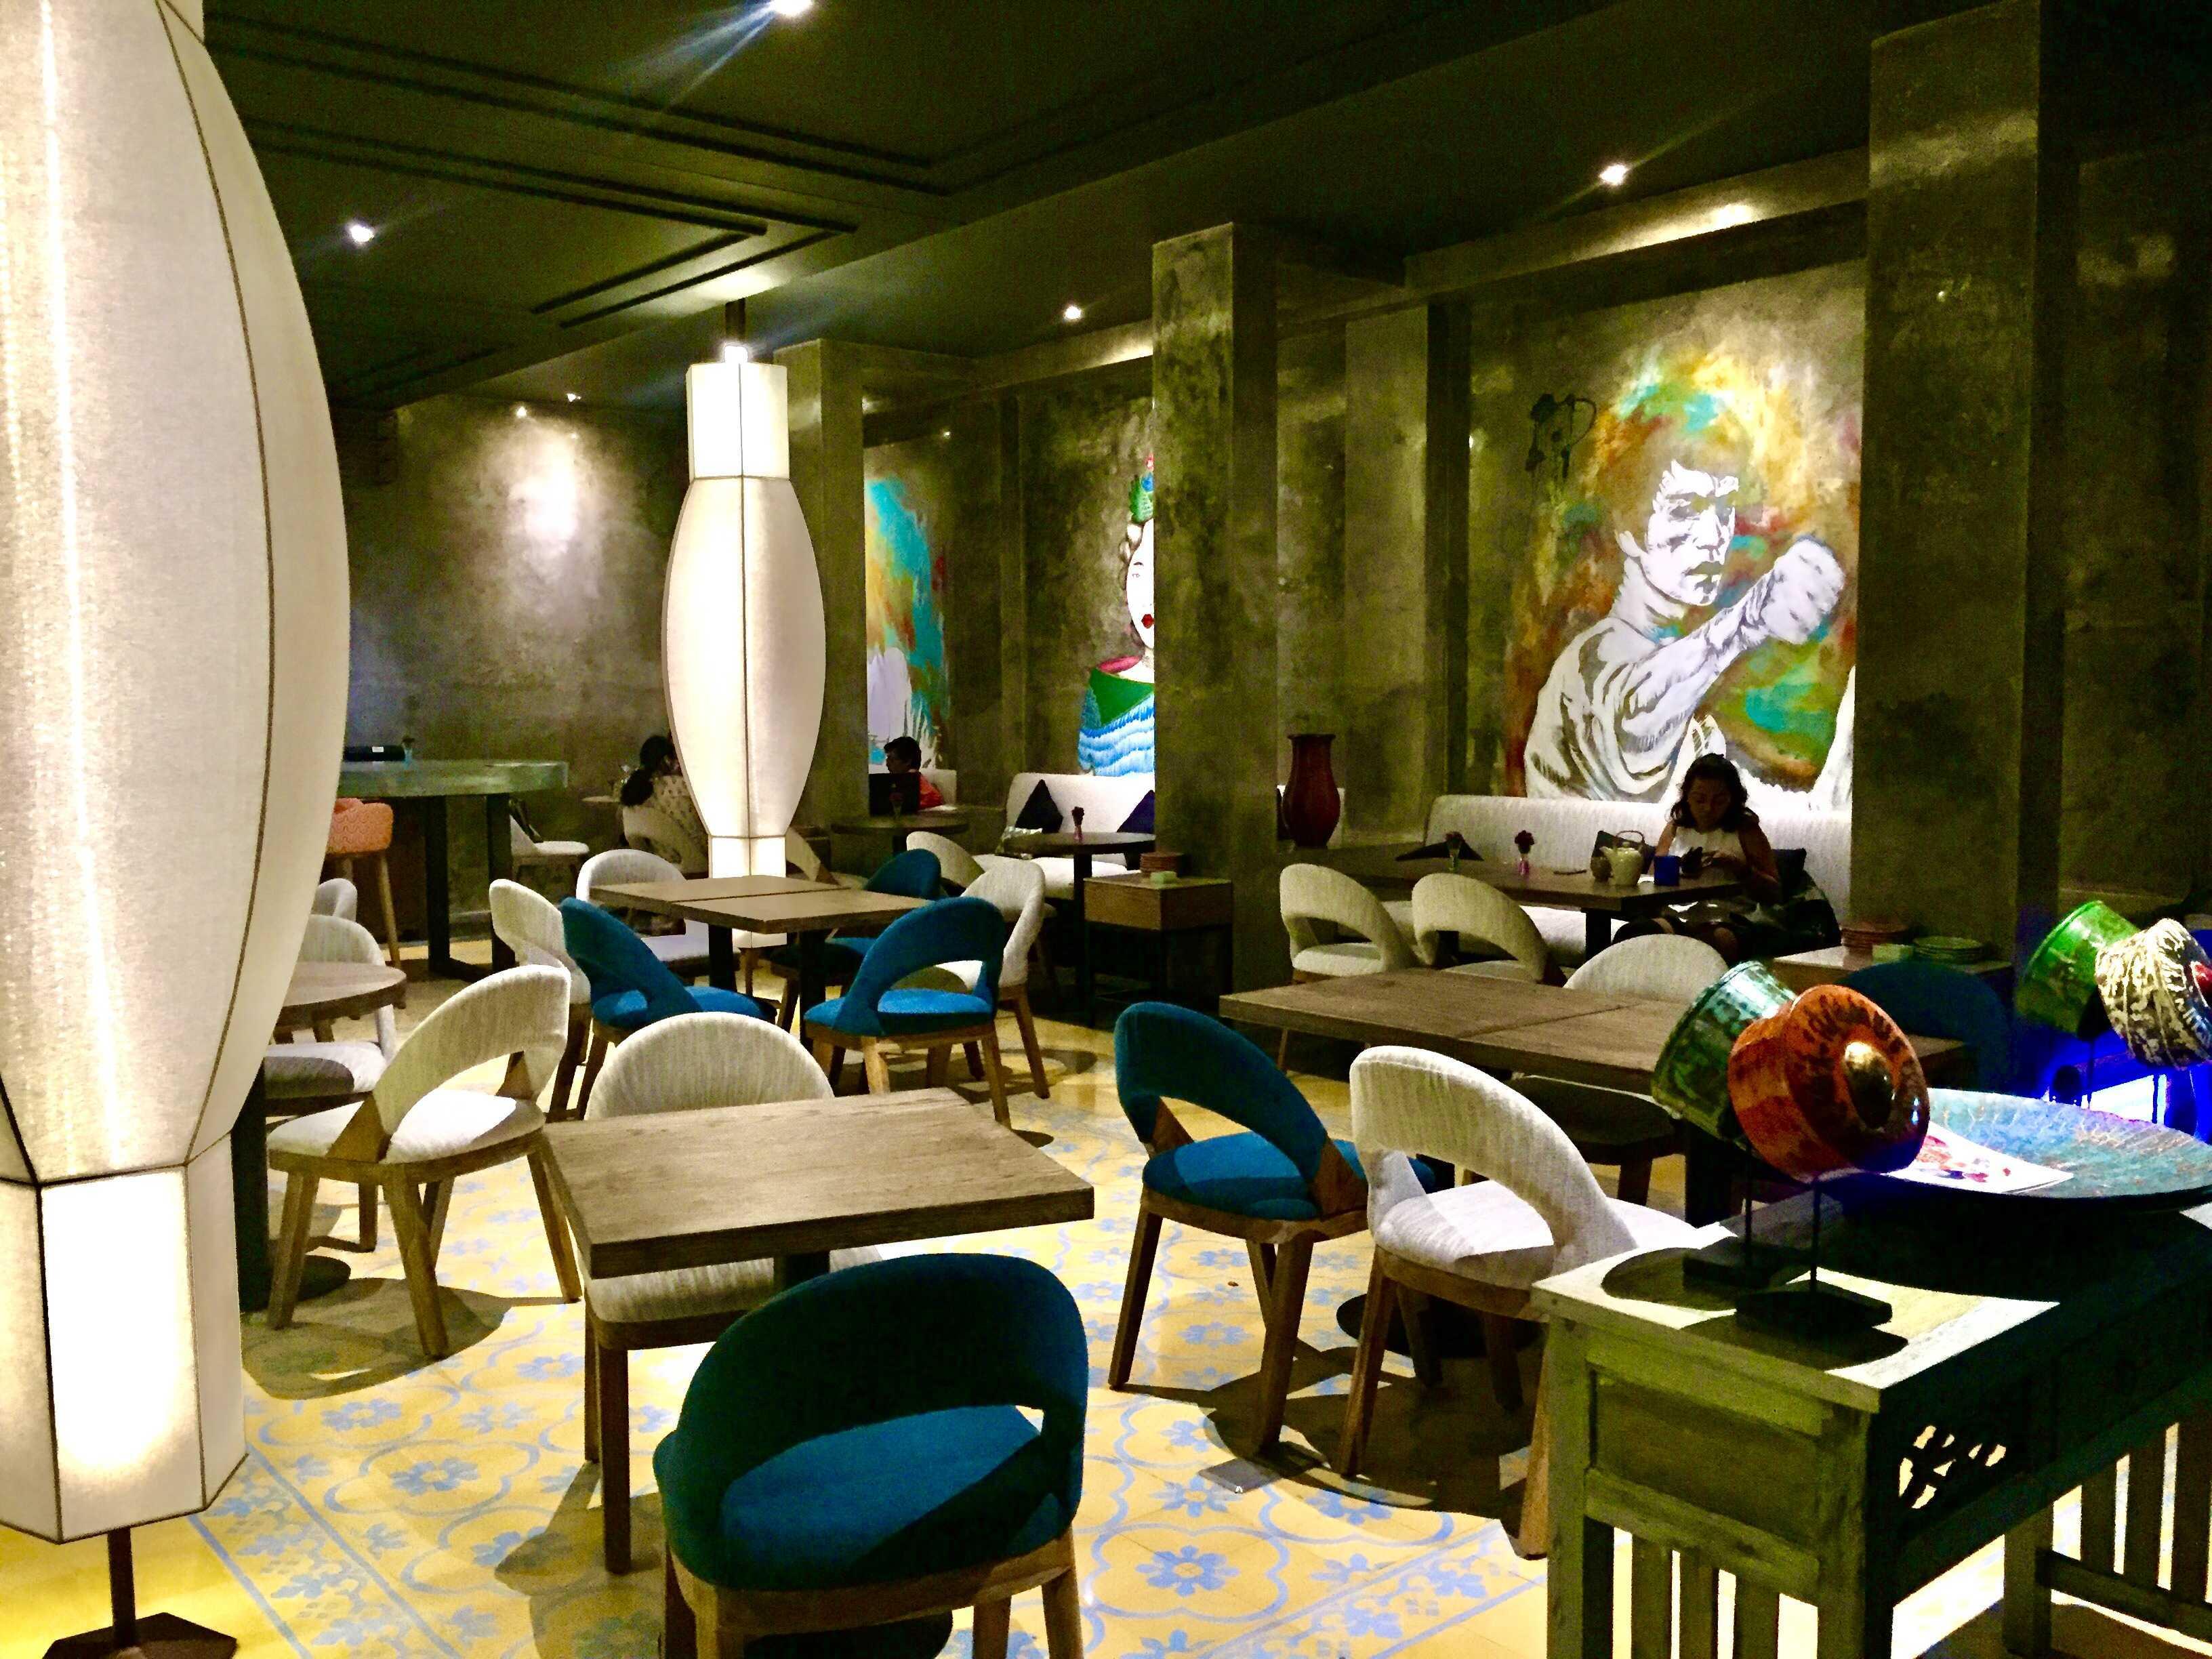 Seed Studio Moringa Bali, Indonesia Bali, Indonesia Seed-Studio-Moringa   115804